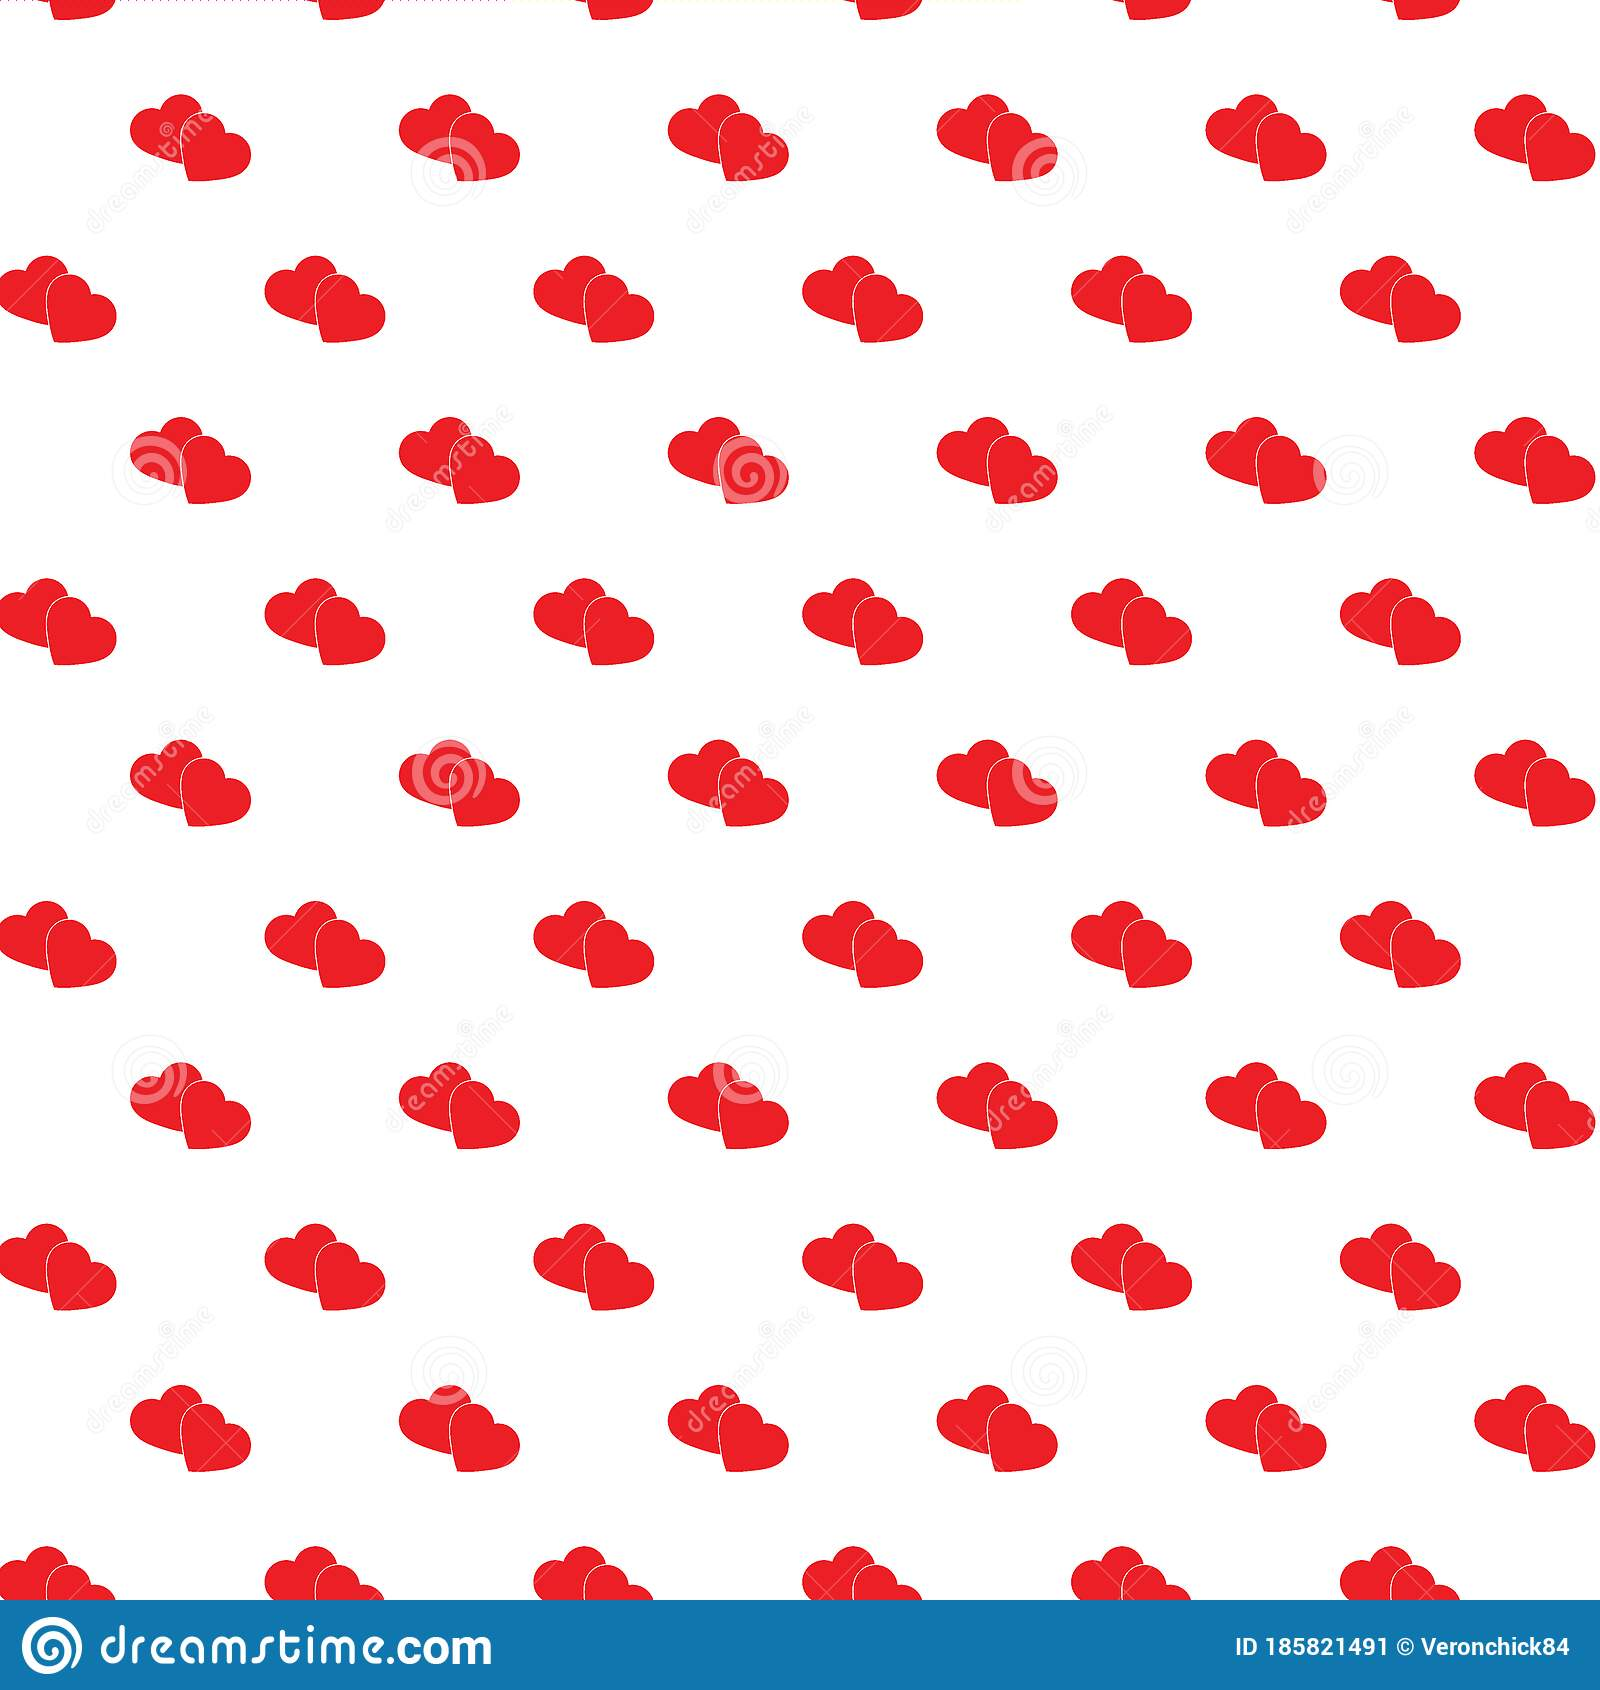 Heart Seamless Pattern Love Background Red Cartoon Texture For Kids Pattern For Children Background Stock Vector Illustration Of Element Modern 185821491